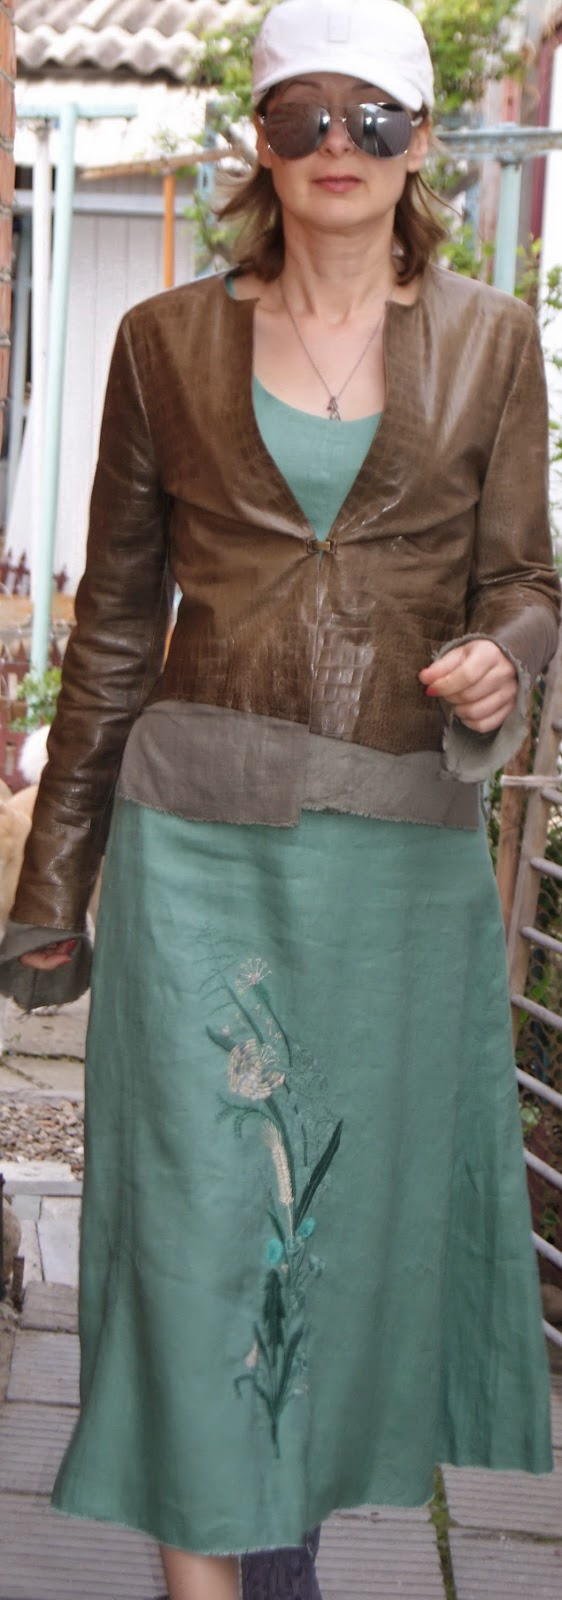 КУРТКА, САРАФАН, шитье, сшить куртку, вышивка на сарафане, сарафан, лен, кожа, сарафан льняной, мой пес, шью сама, сшила куртку из кожи, сшила сарафан